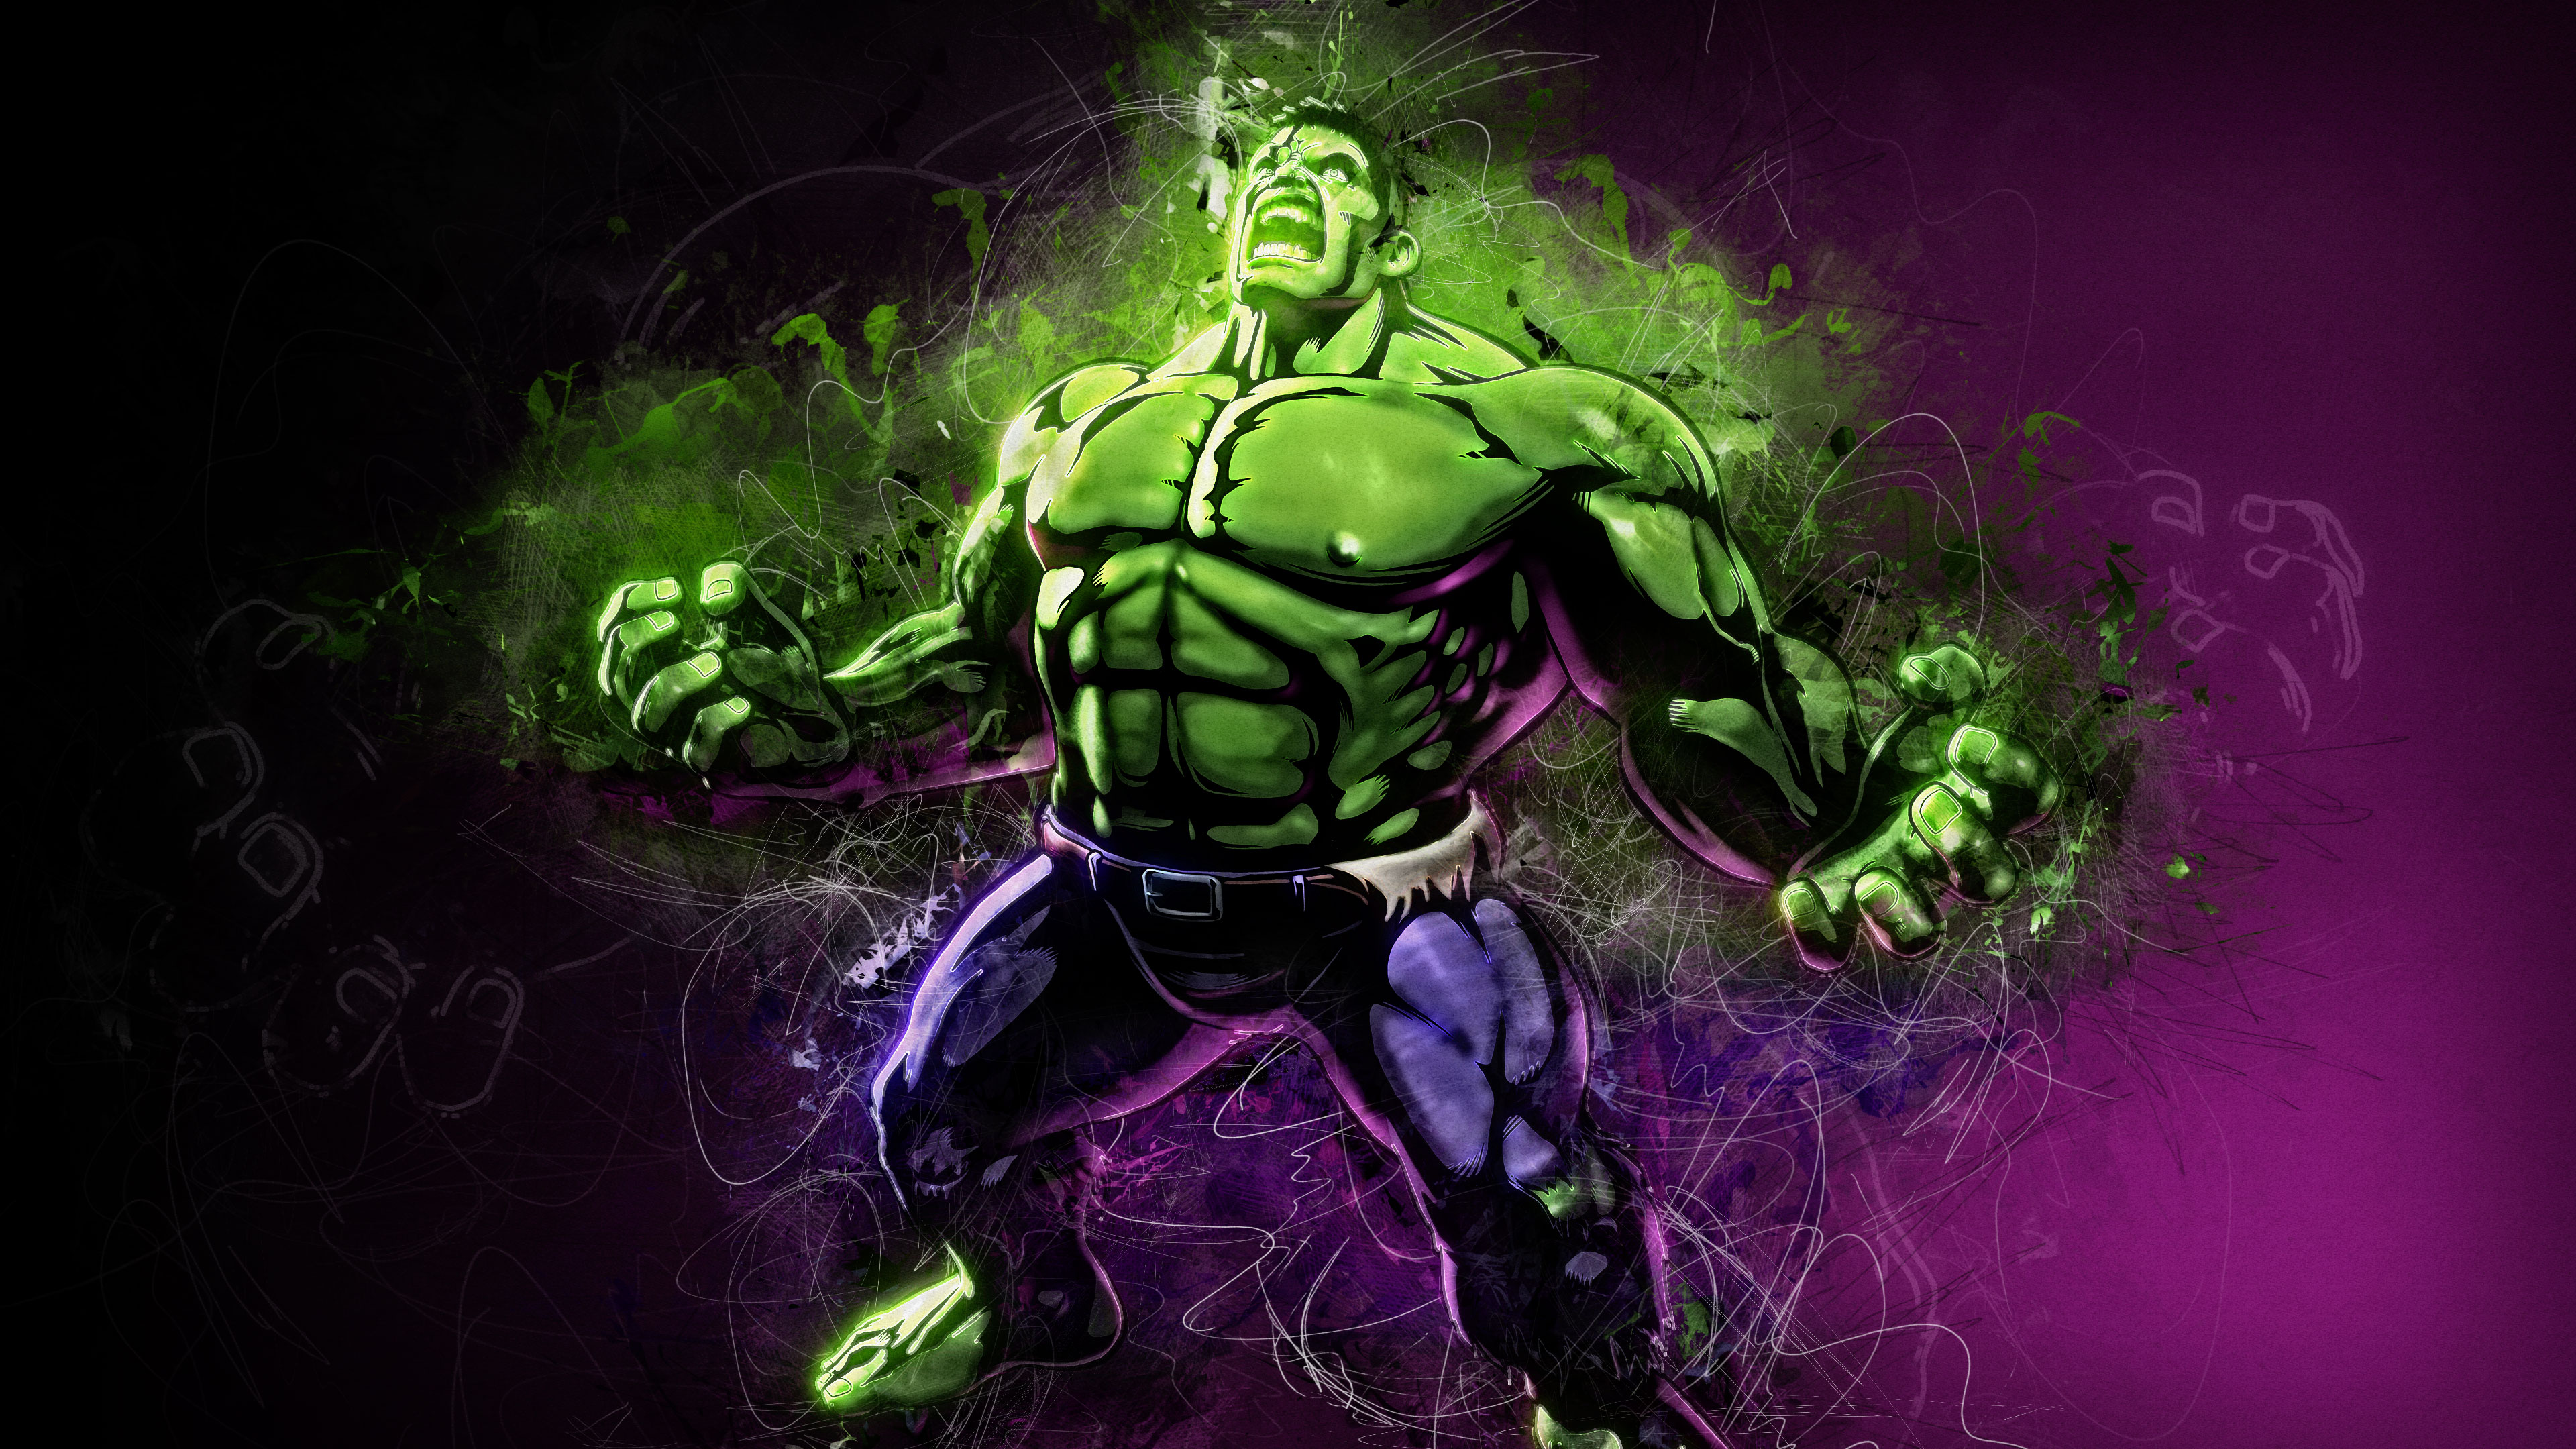 hulk artwork 4k 1536521839 - Hulk Artwork 4k - superheroes wallpapers, hulk wallpapers, hd-wallpapers, digital art wallpapers, artwork wallpapers, artist wallpapers, 4k-wallpapers